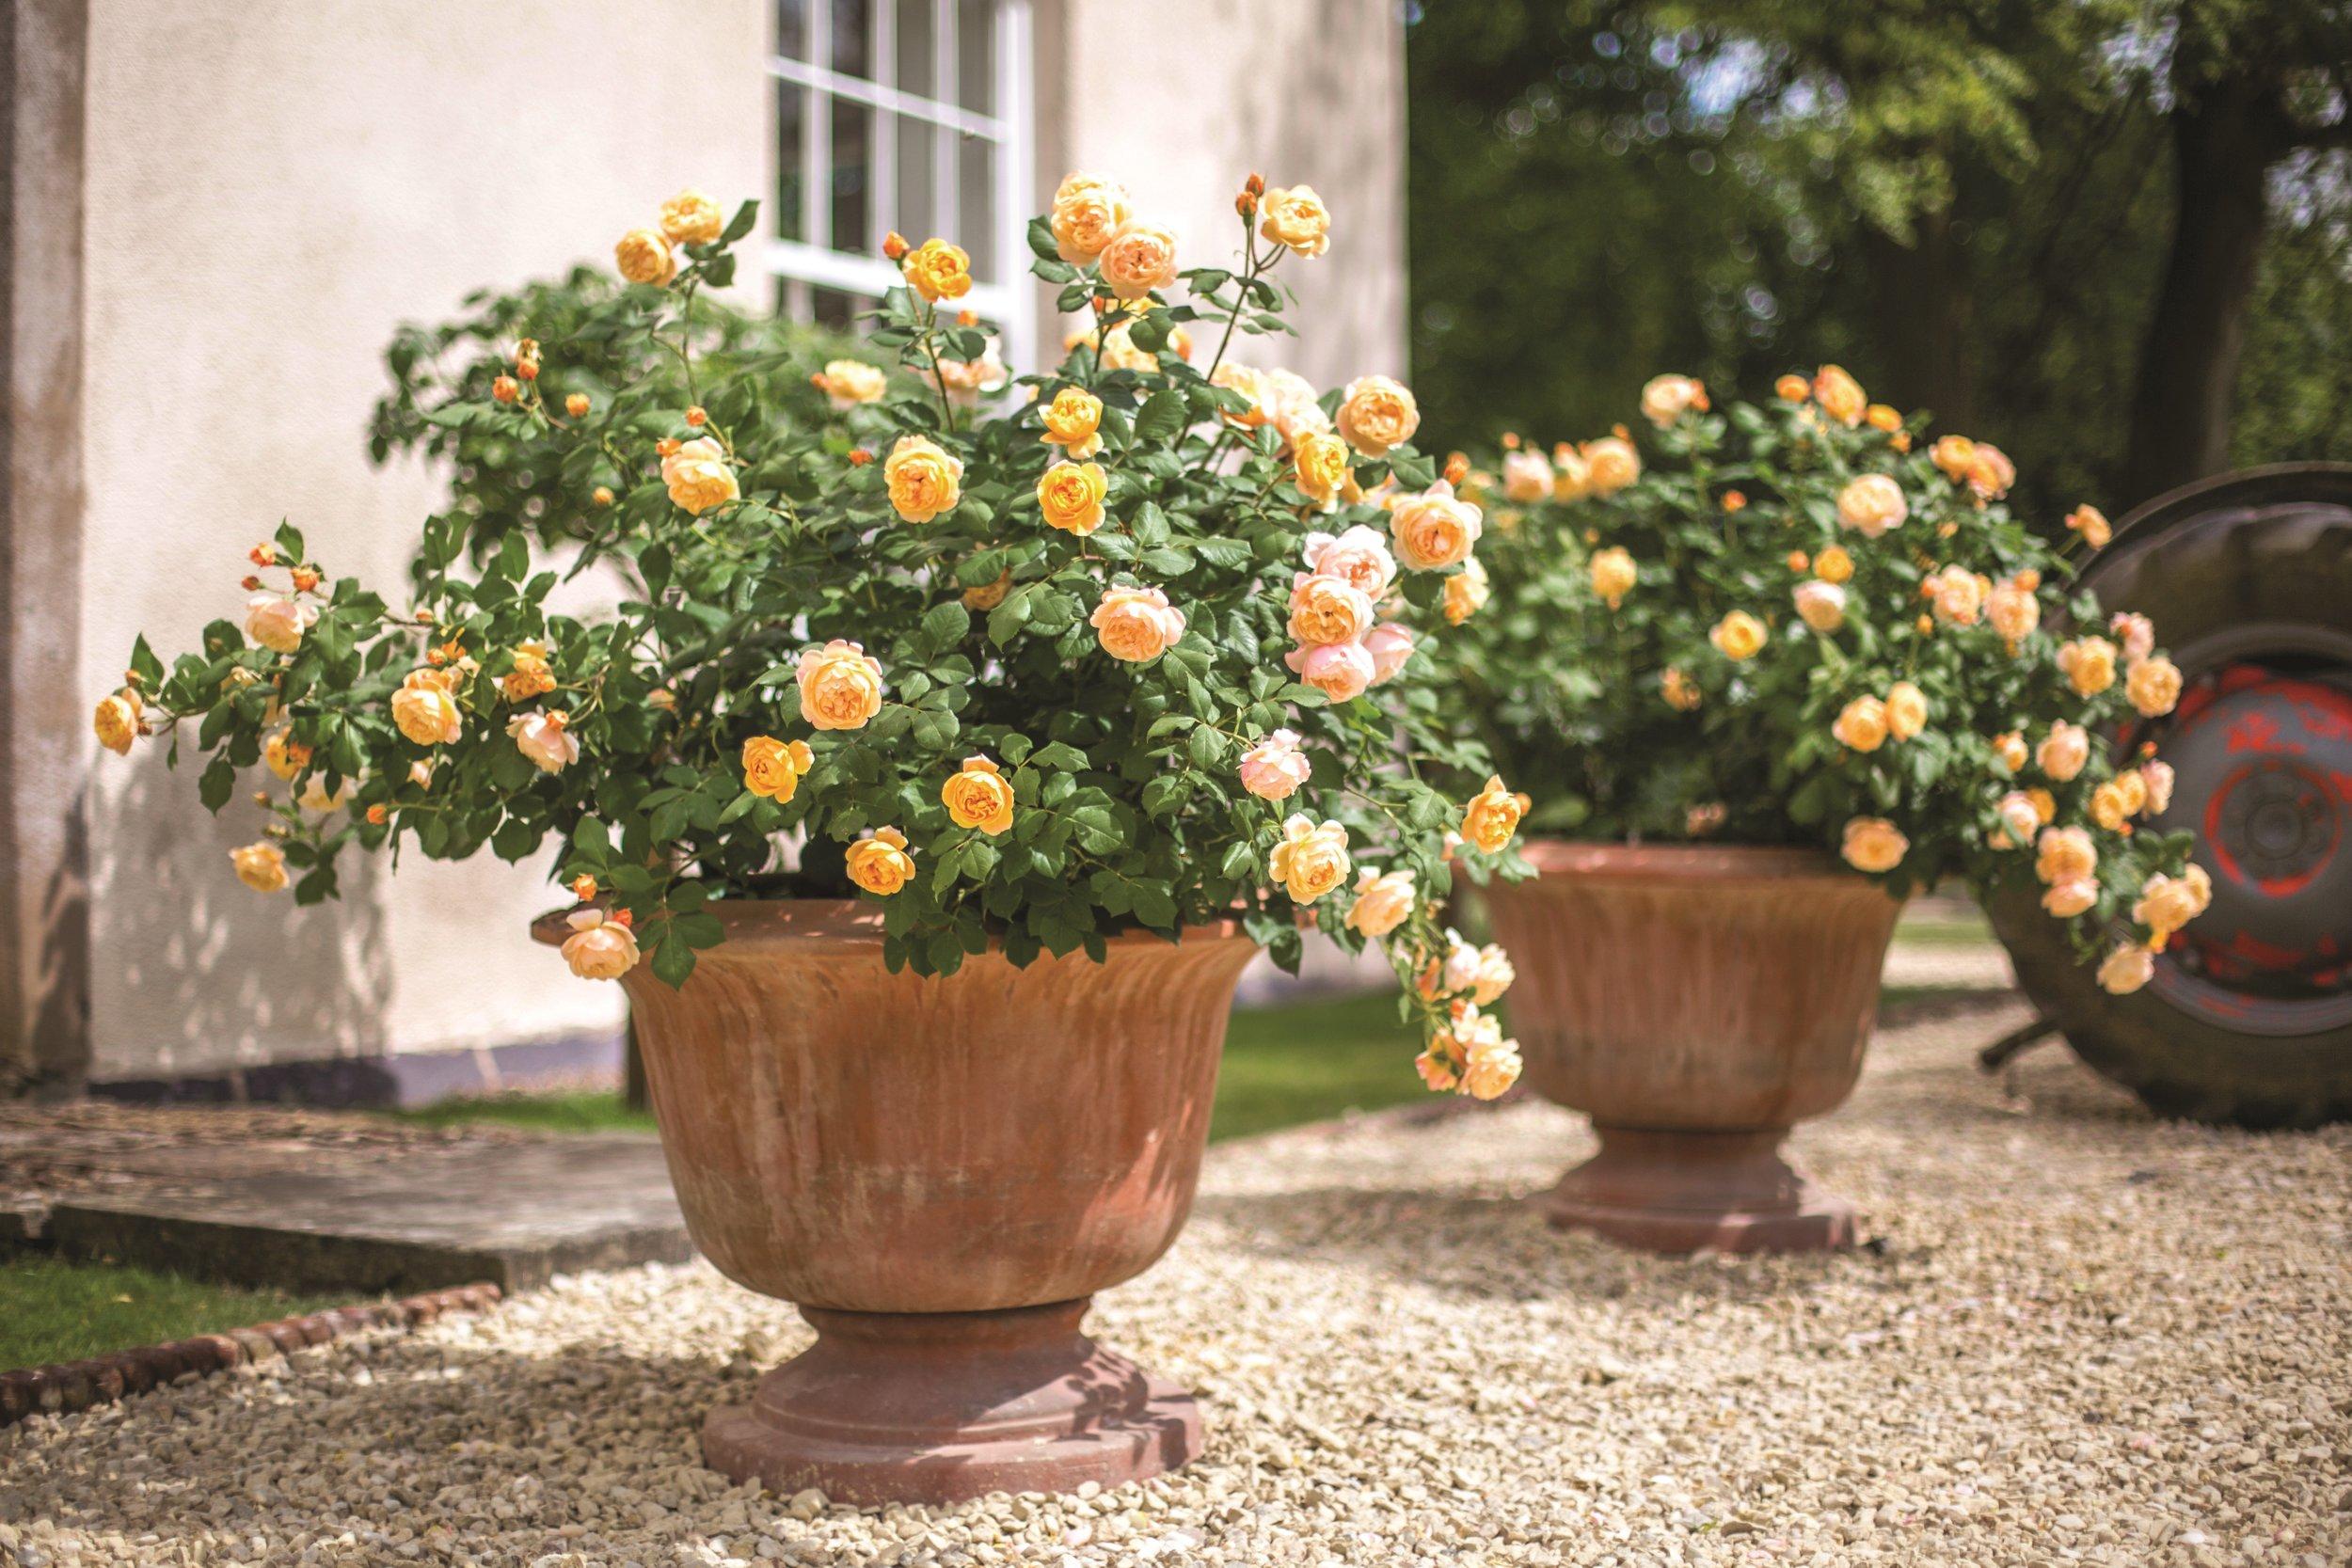 David Austin Roses - Image resize.jpg